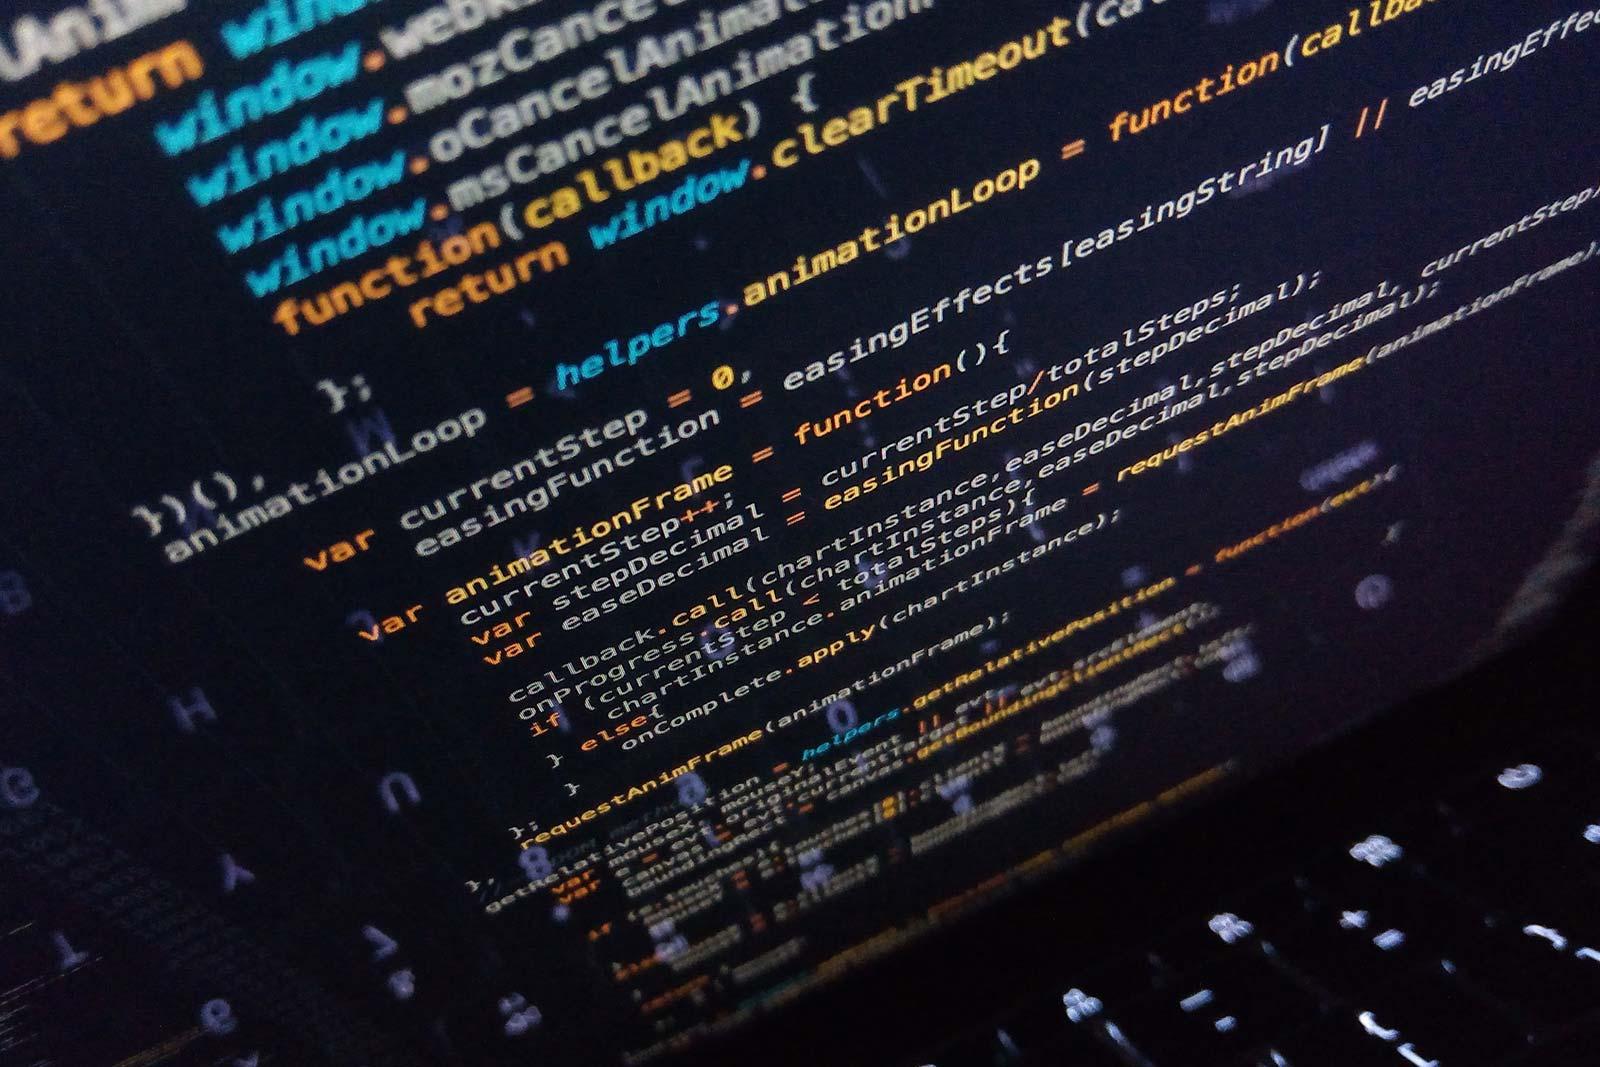 Enhance Form Interaction Control with custom JavaScript